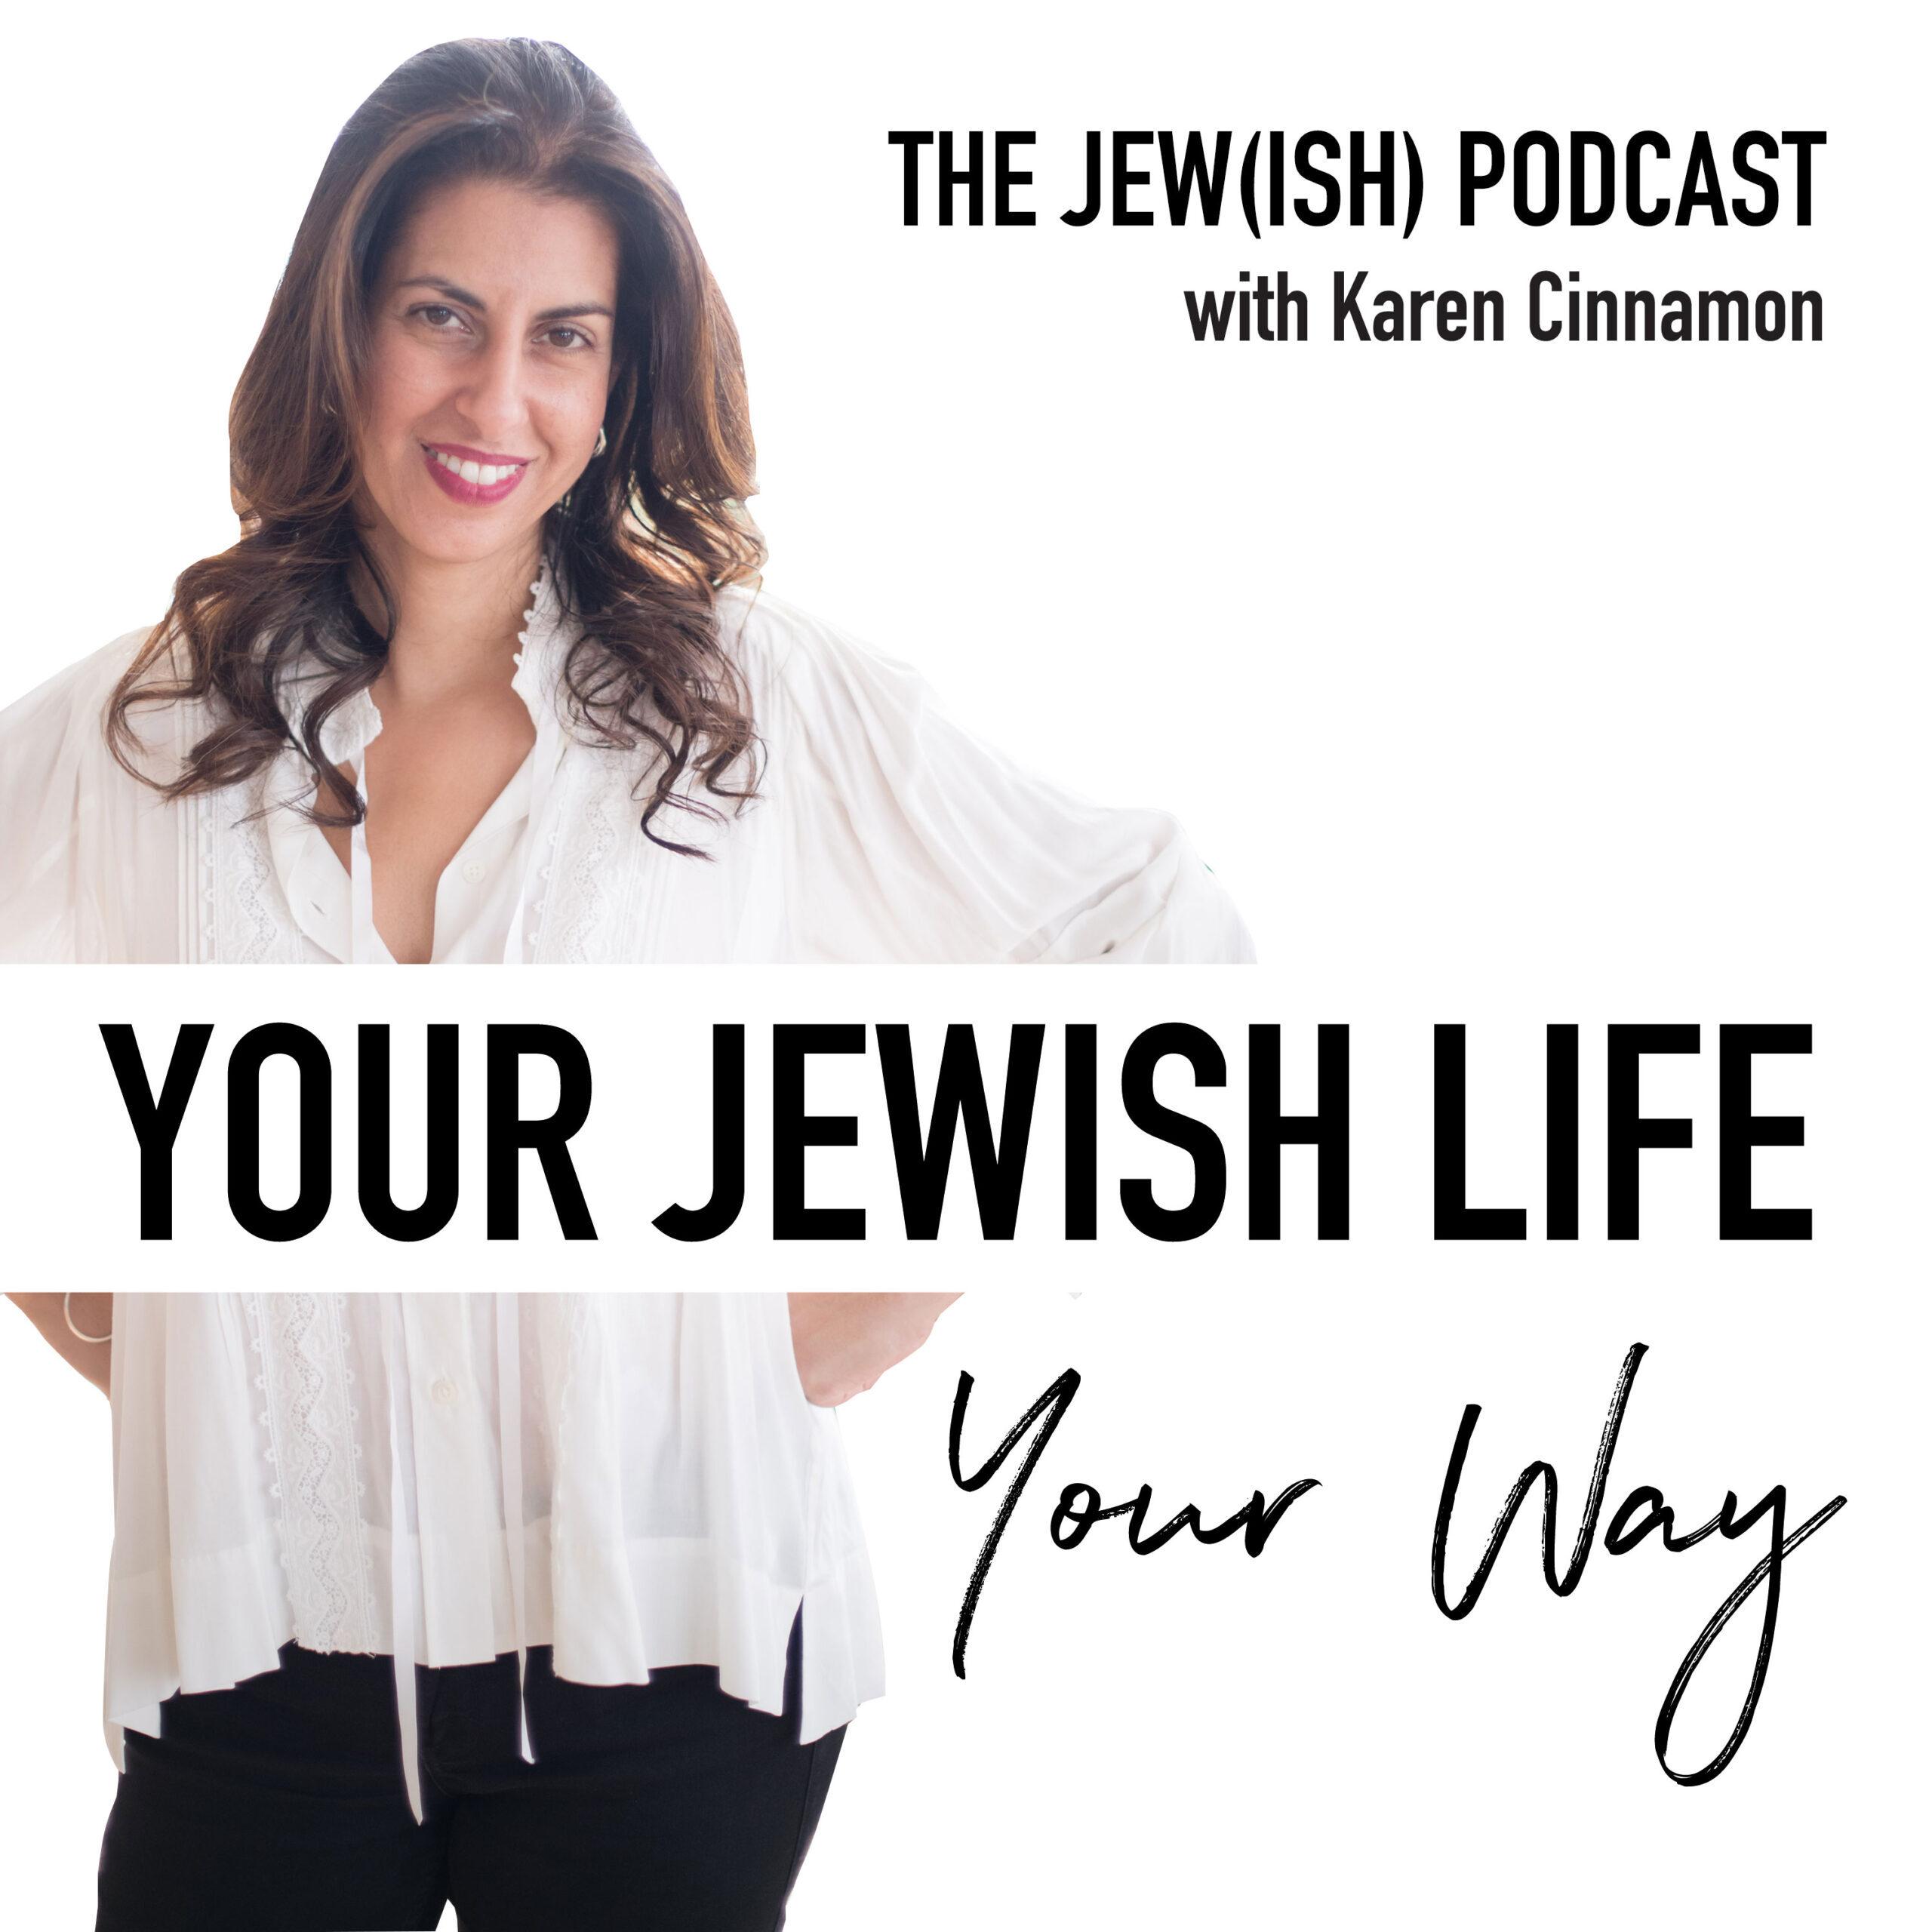 Your Jewish Life